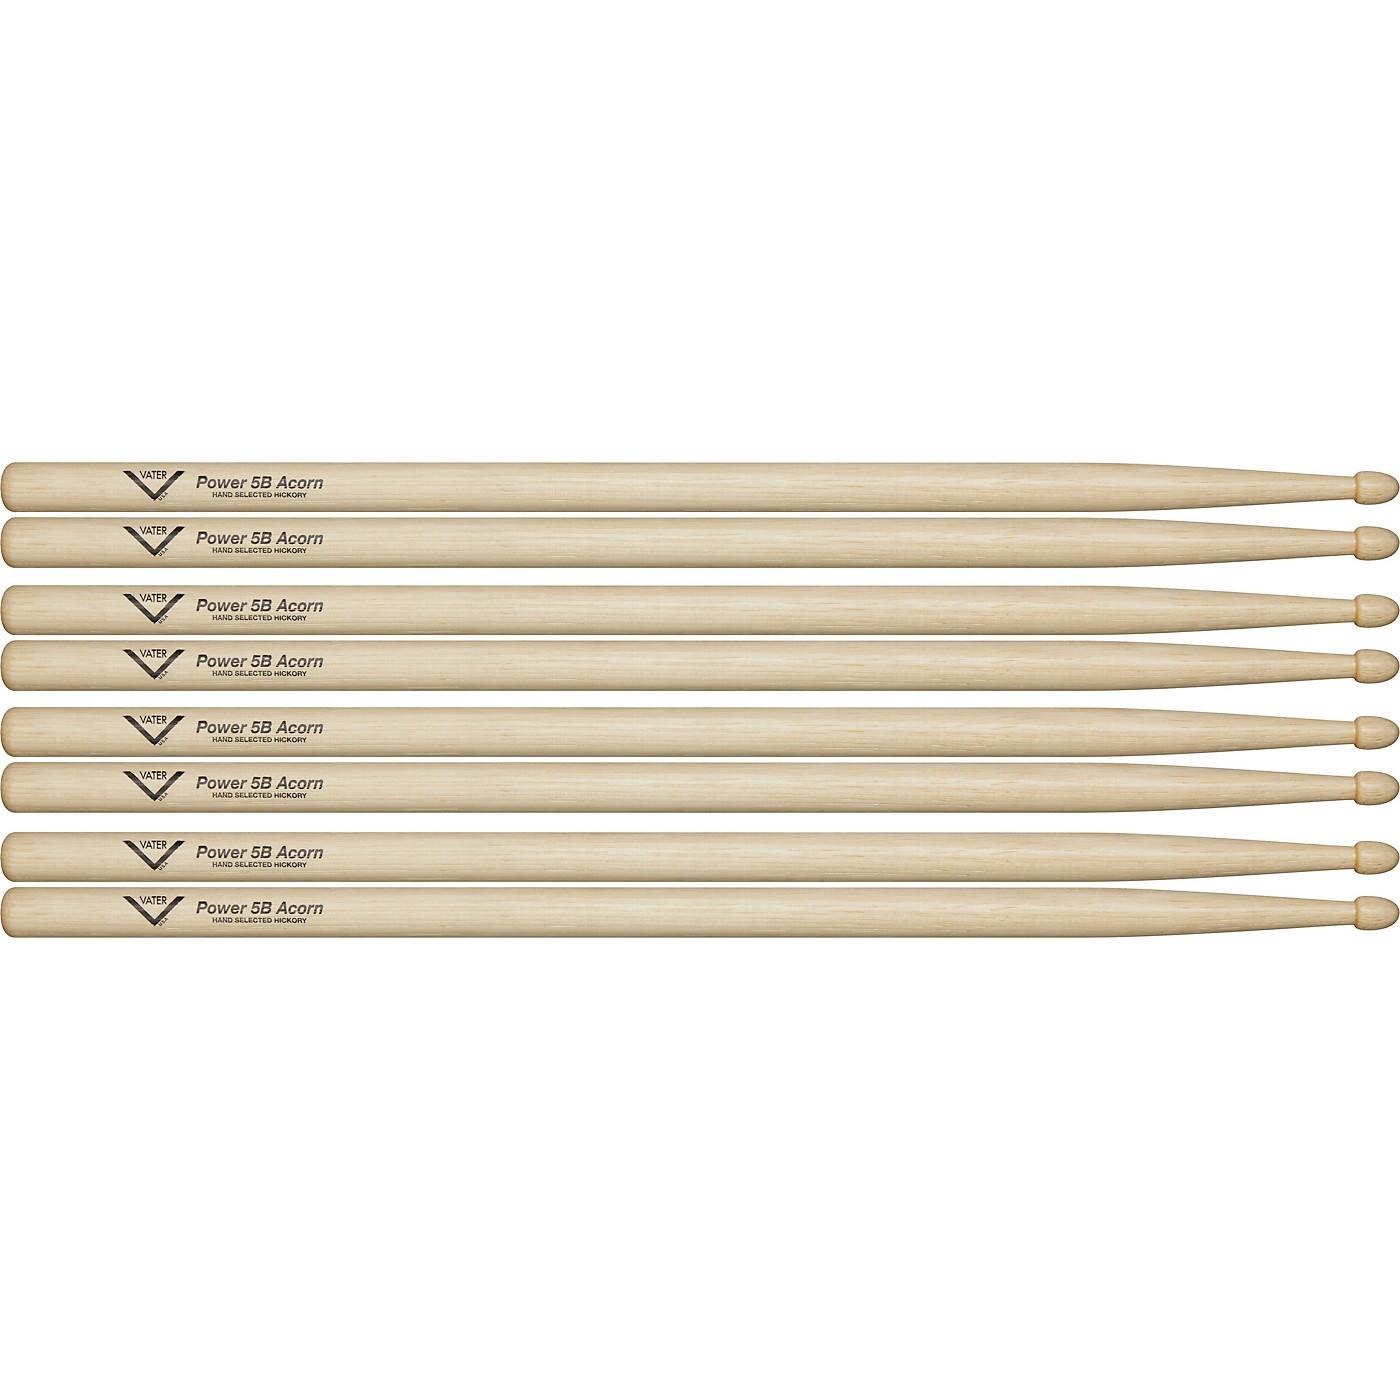 Vater Power 5B Acorn Drum Sticks - Buy 3, Get 1 Free Value Pack thumbnail